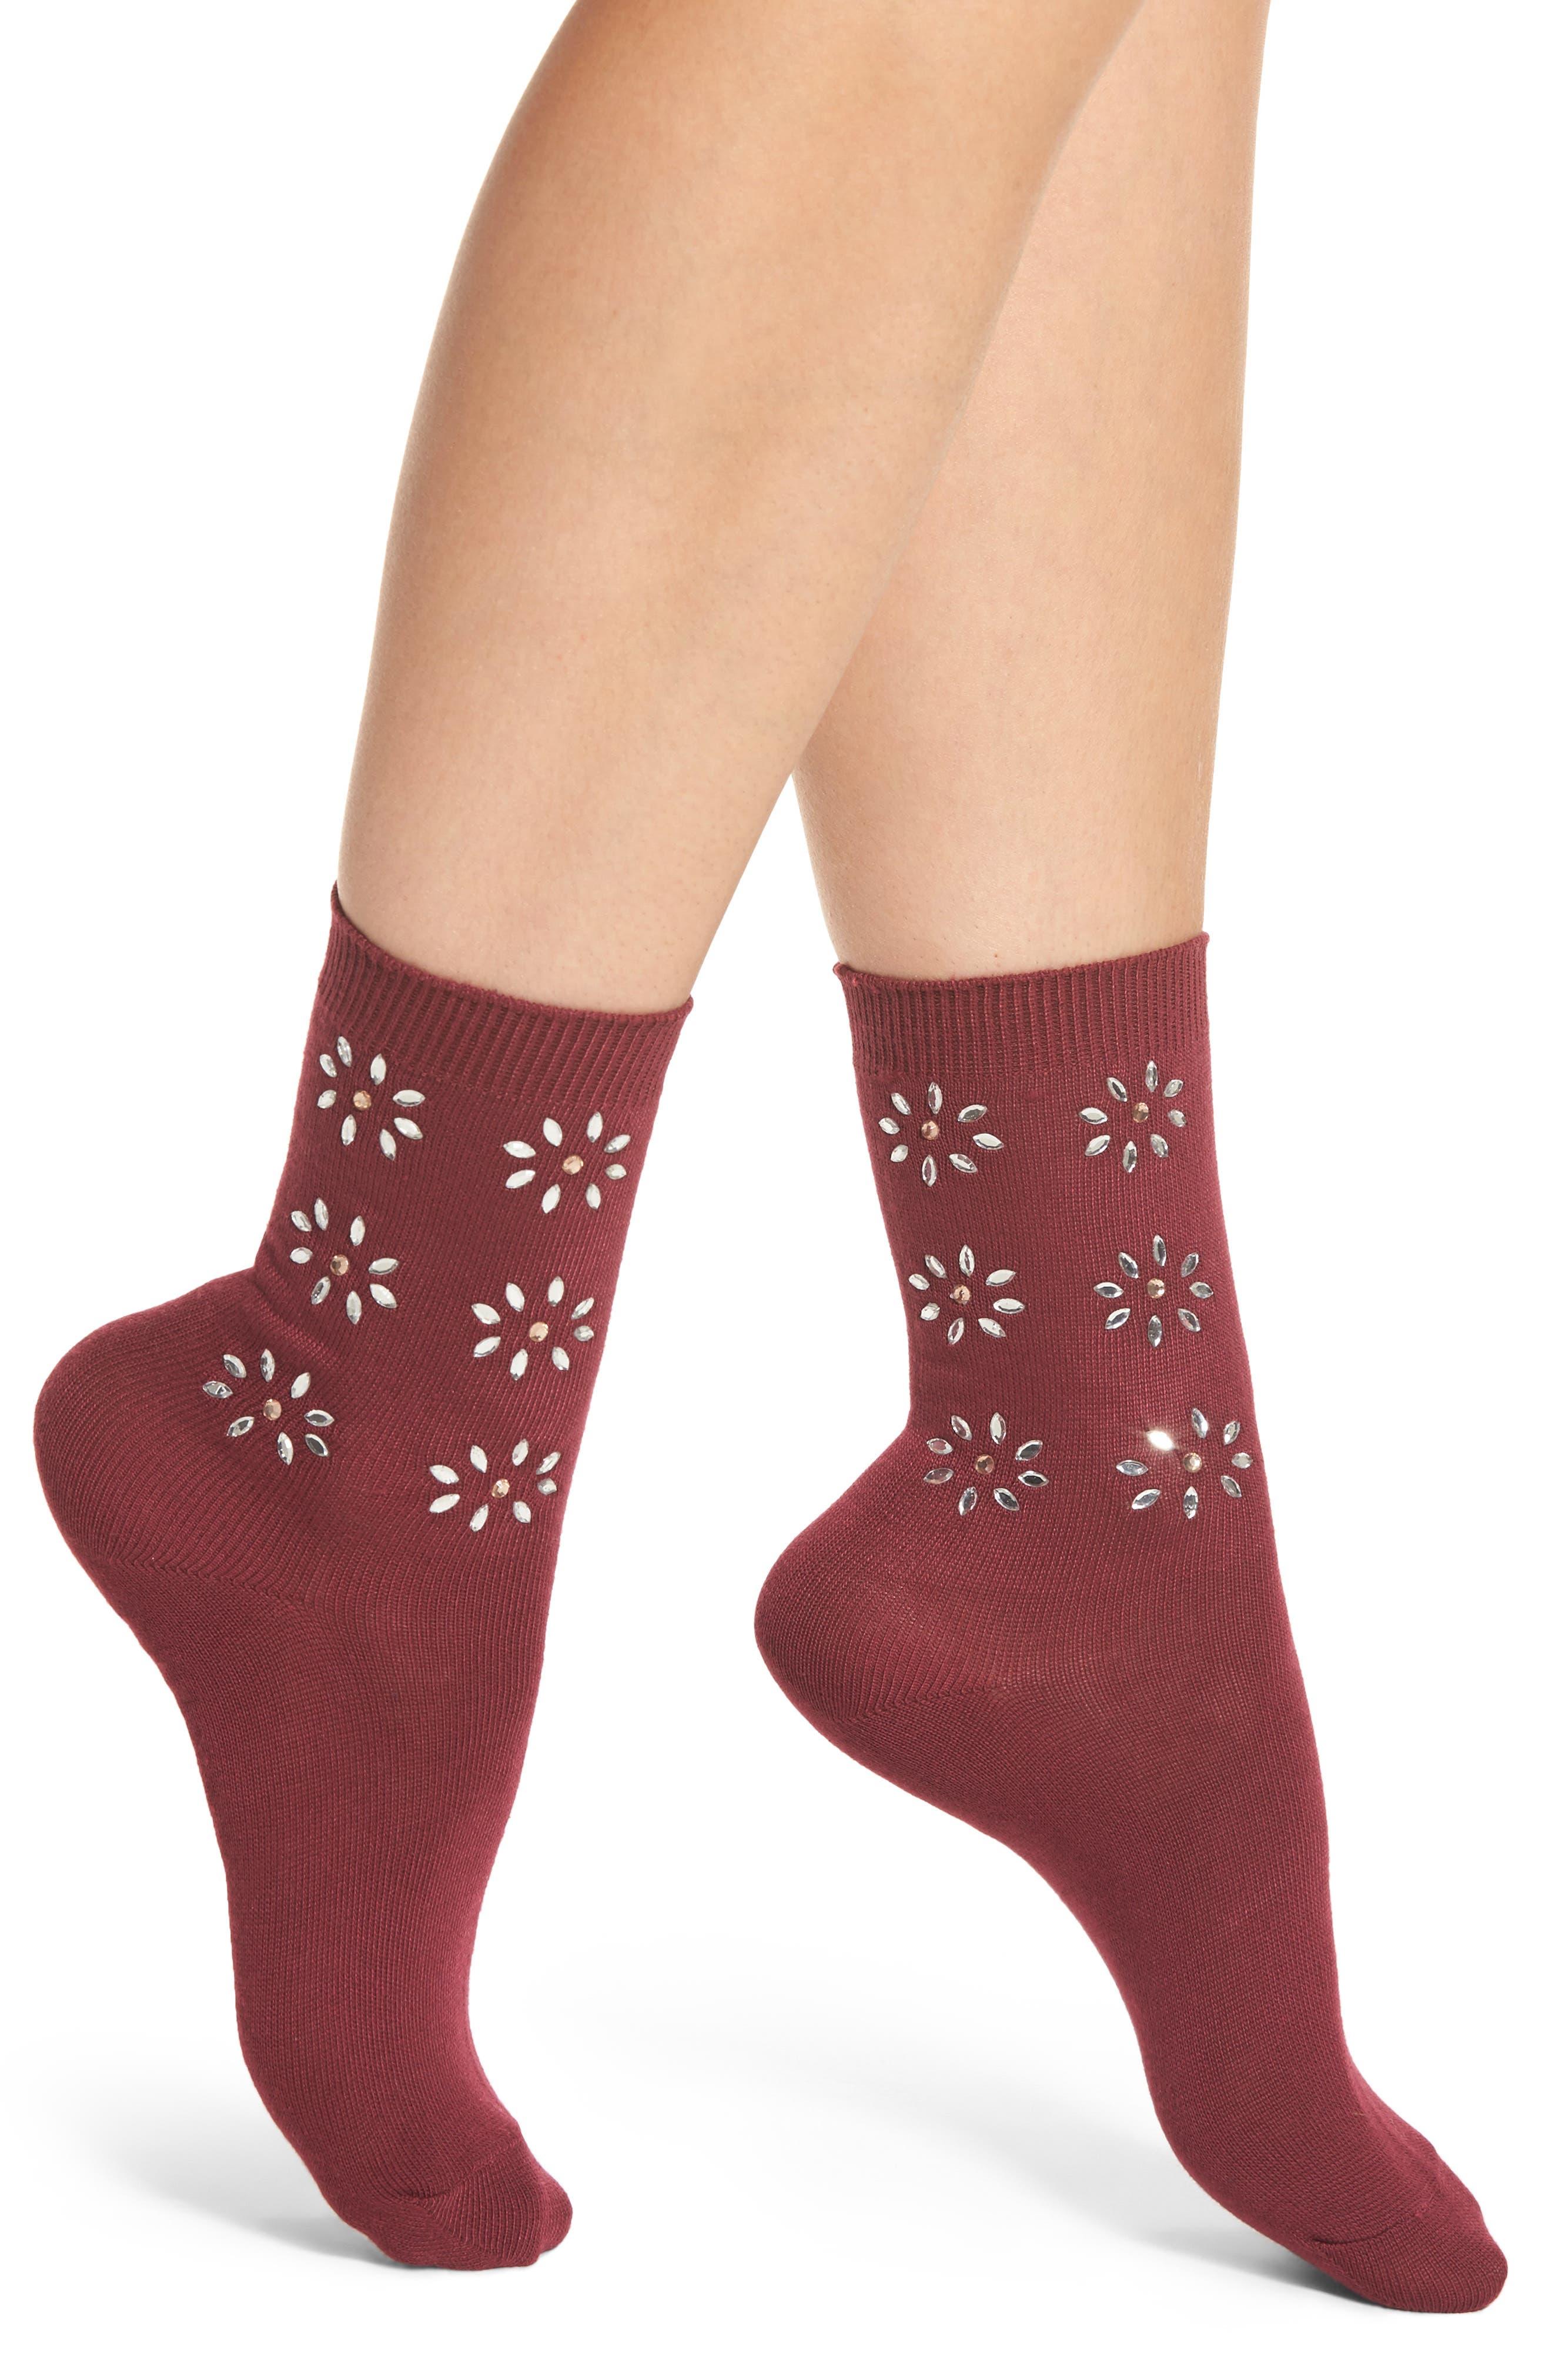 Alternate Image 1 Selected - Nordstrom Crystal Flower Crew Socks